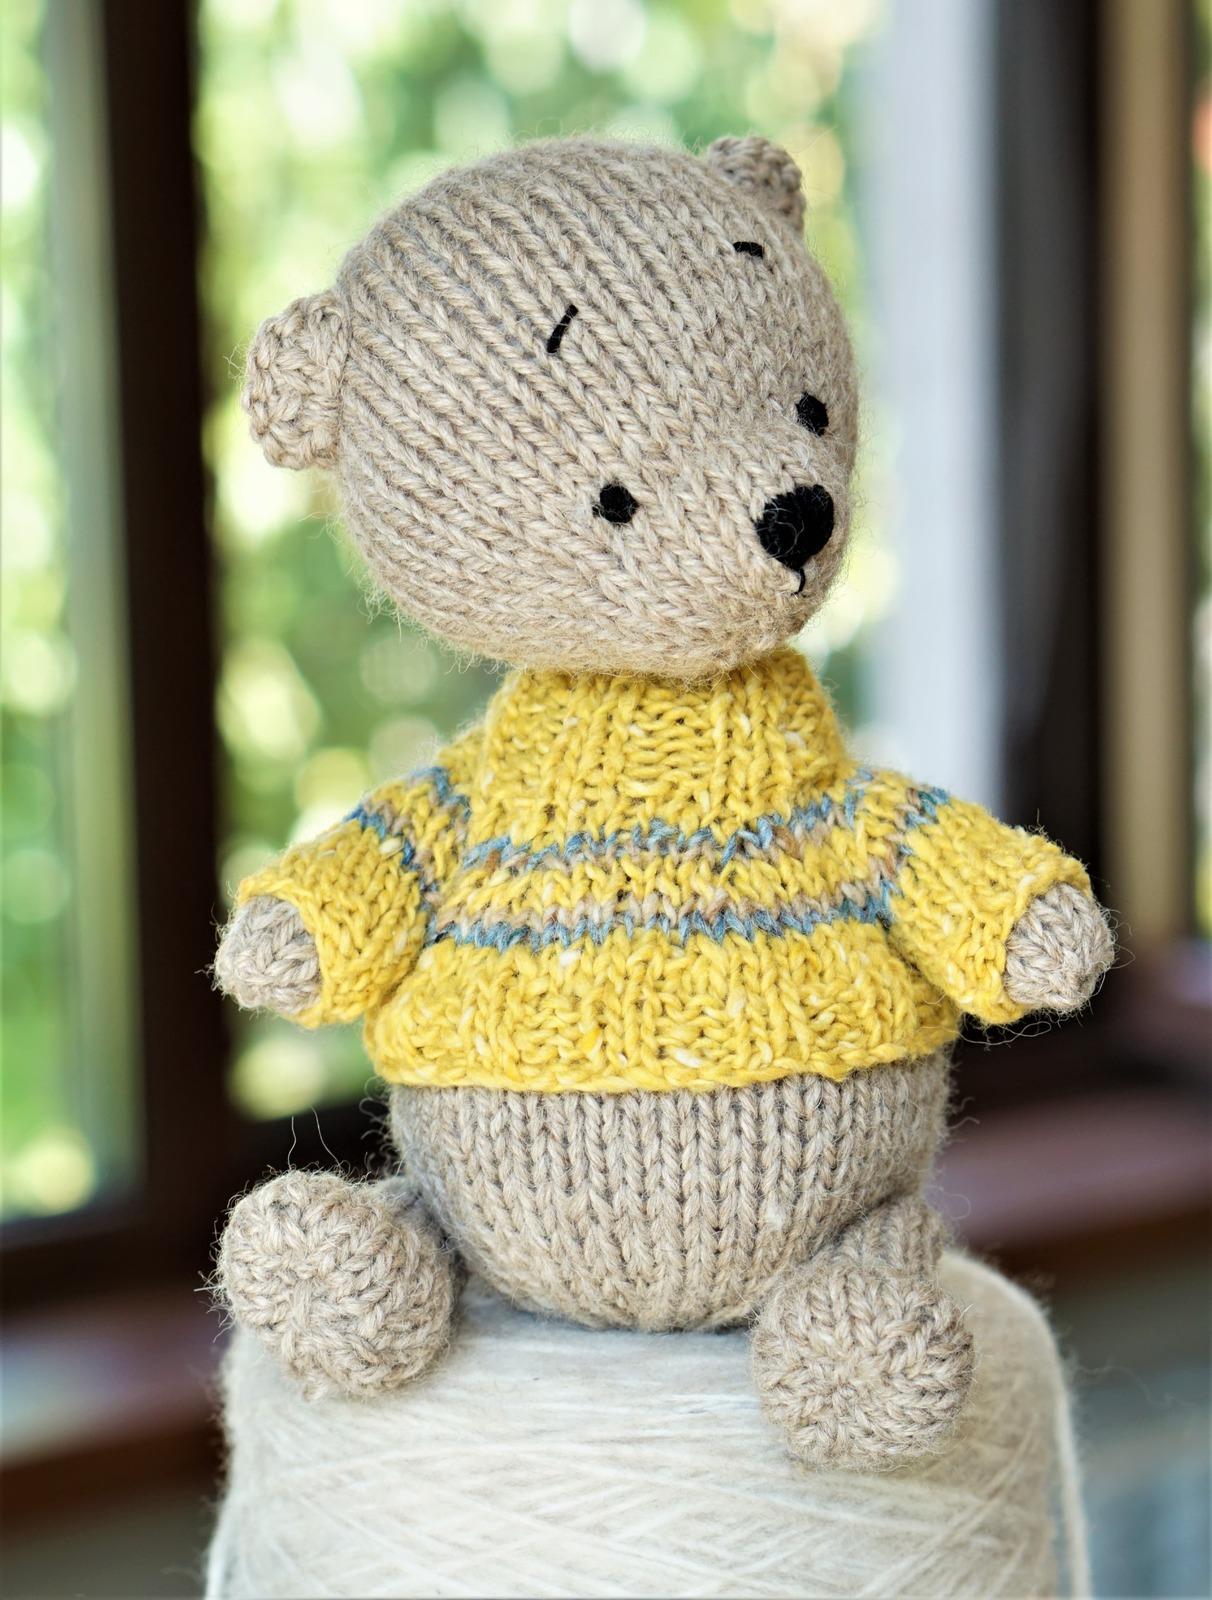 Knitted Little Teddy Bear